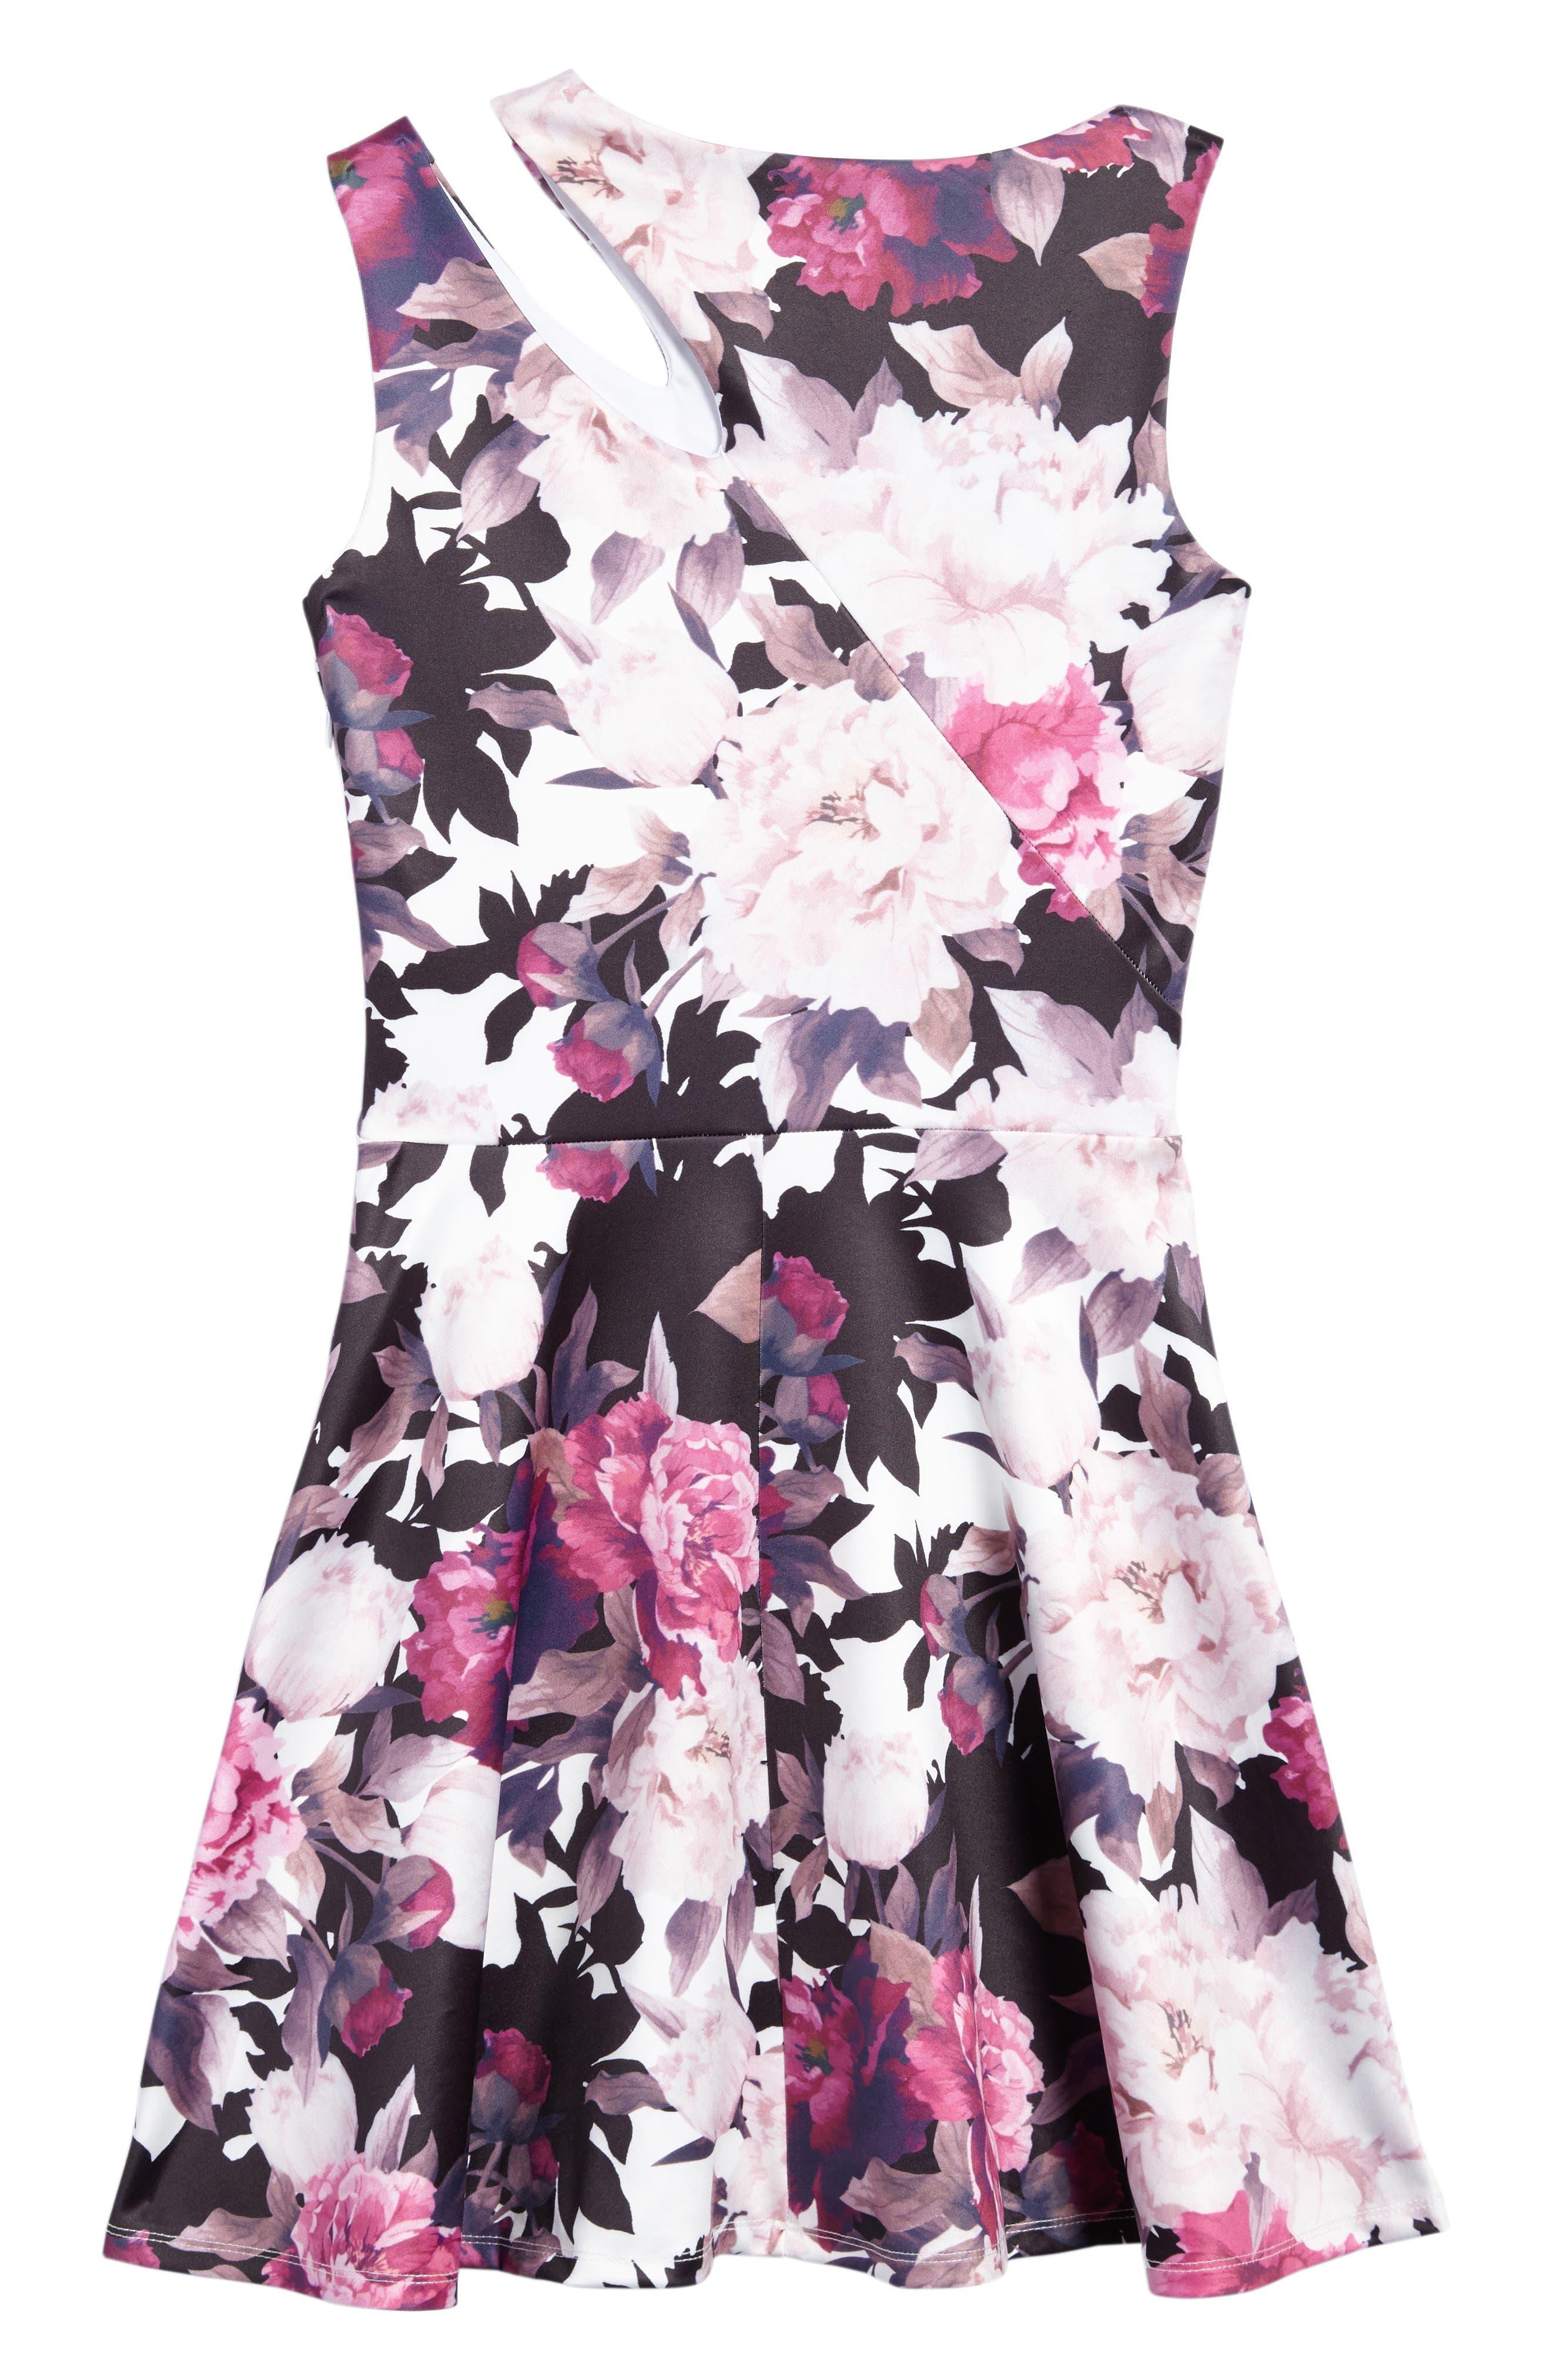 Floral Print Dress,                             Alternate thumbnail 2, color,                             101